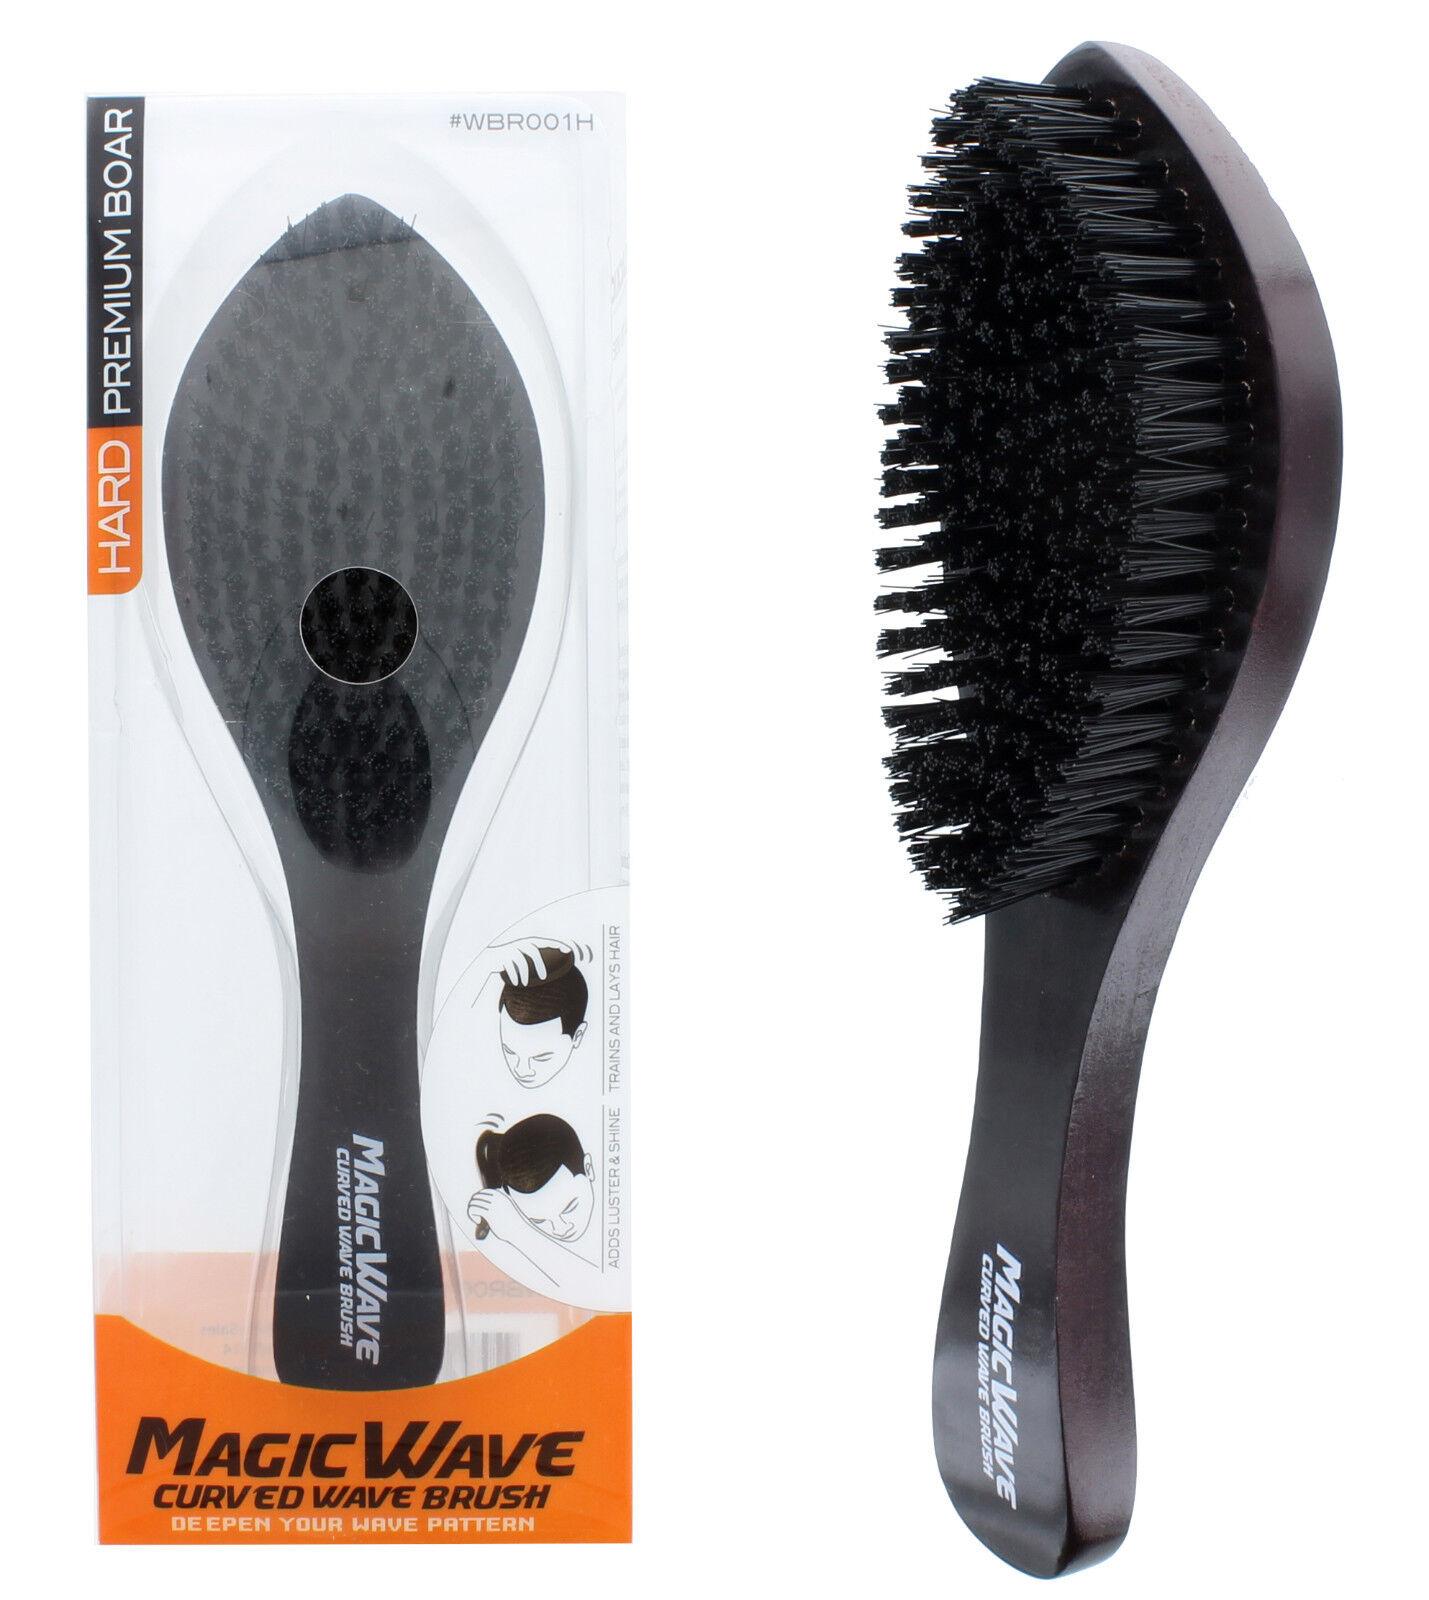 Black Ice Magic Wave 9.25'' Curved Wave Brush Hard Premium